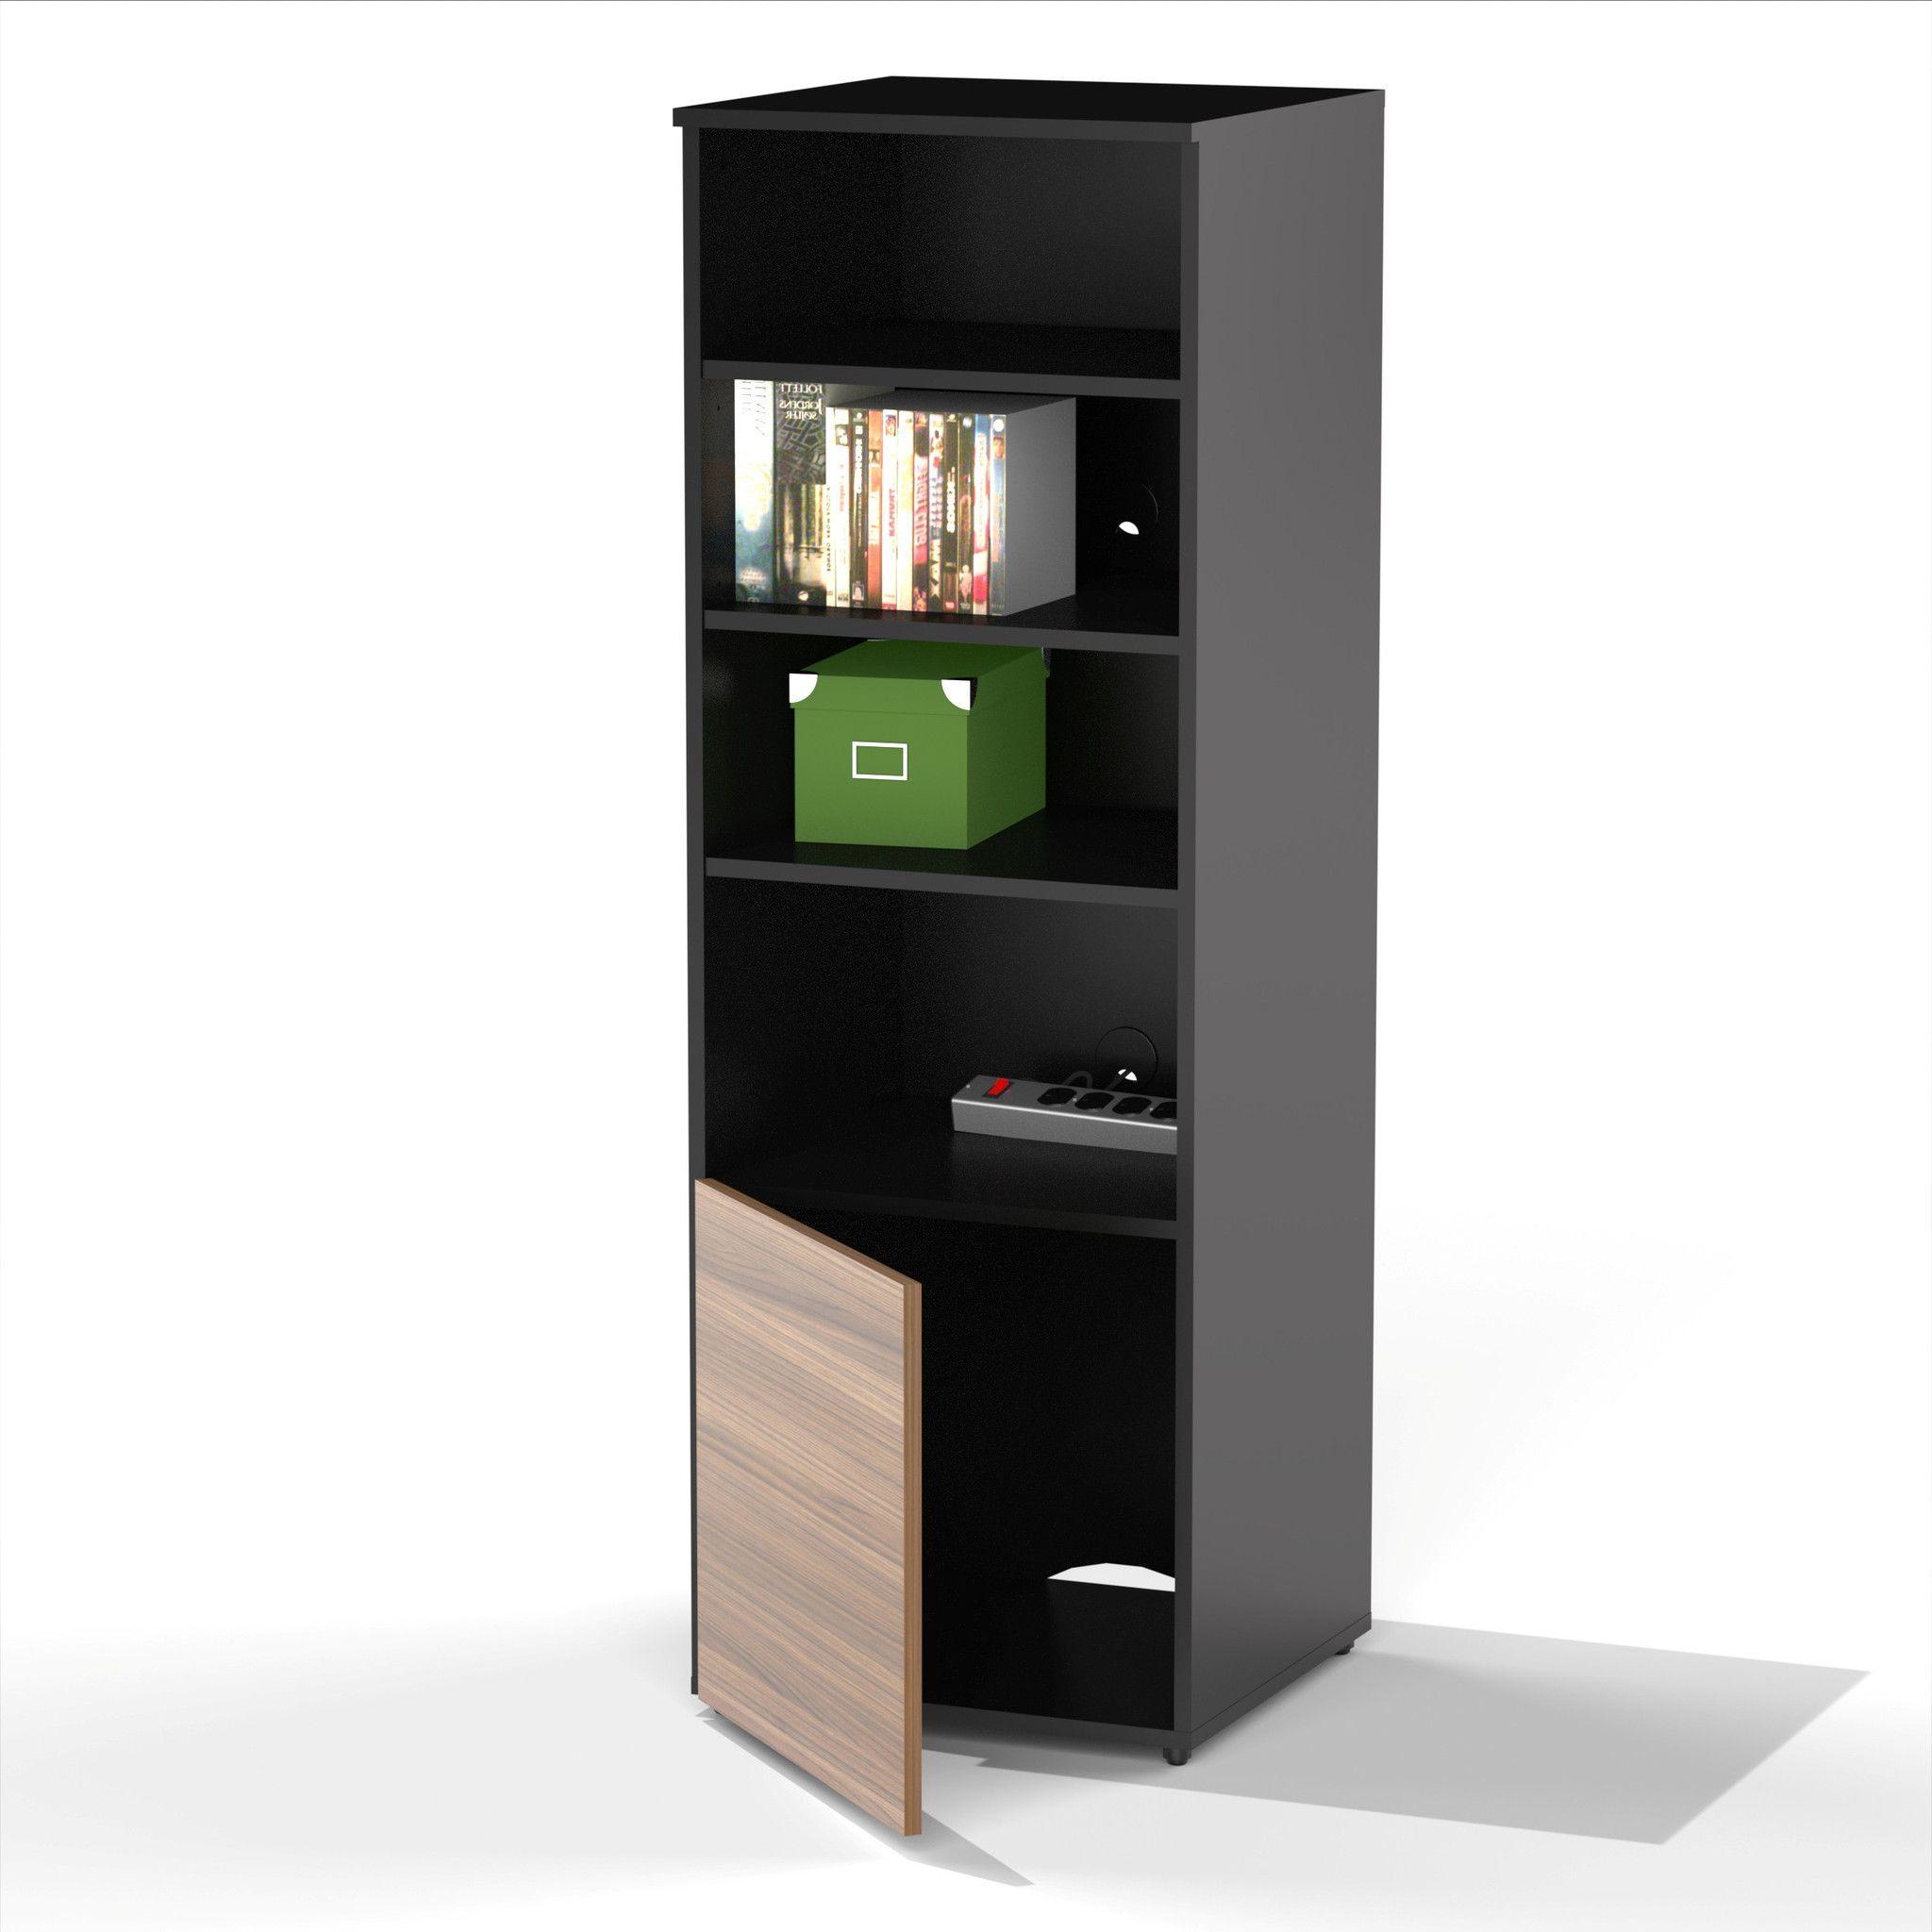 plans unit in ebay mid room bookcase century divider narrow wide bookshelf available tower full west australia shelving walnut modern diy elm size bookcases nz